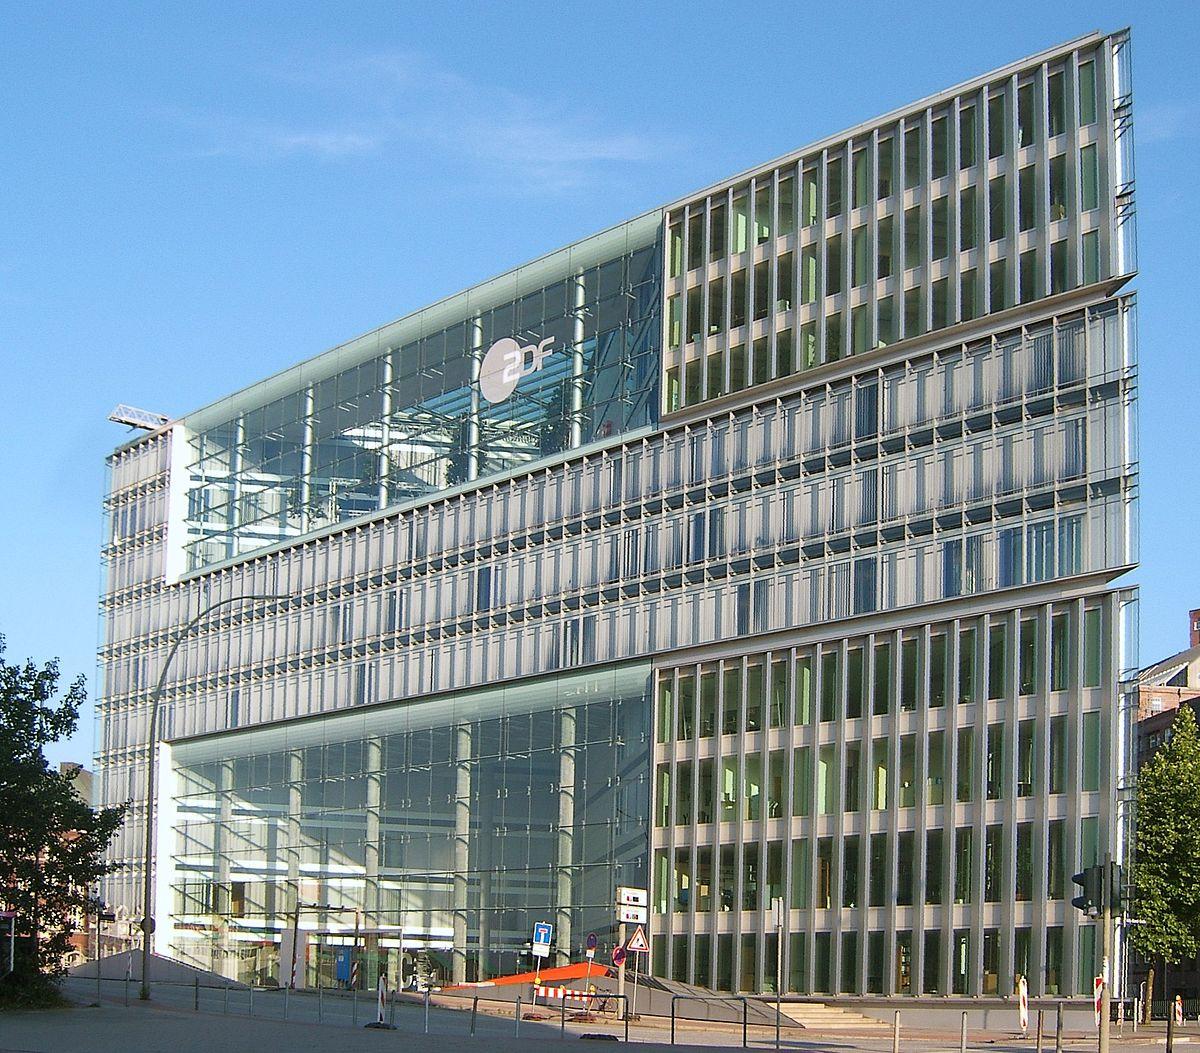 Medien in hamburg wikipedia for Spiegel verlagsgruppe